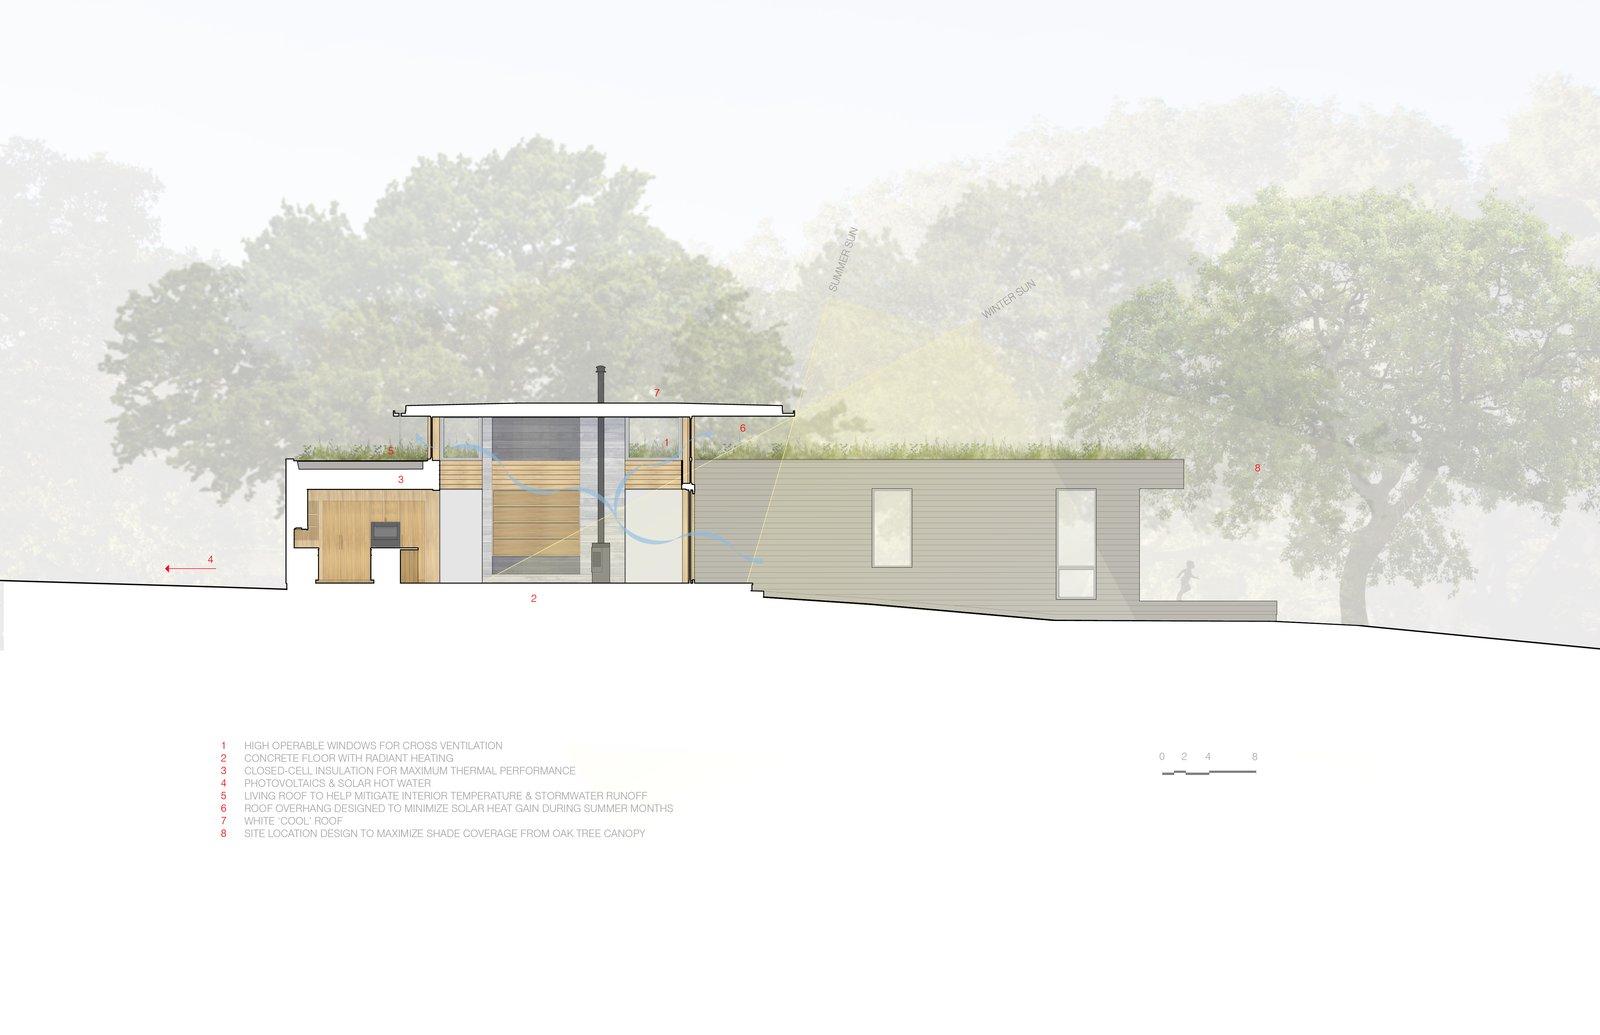 #TurnbullGriffinHaesloop #outdoor #landscape #sustainability  #livingroof Sonoma Residence by Turnbull Griffin Haesloop Architects